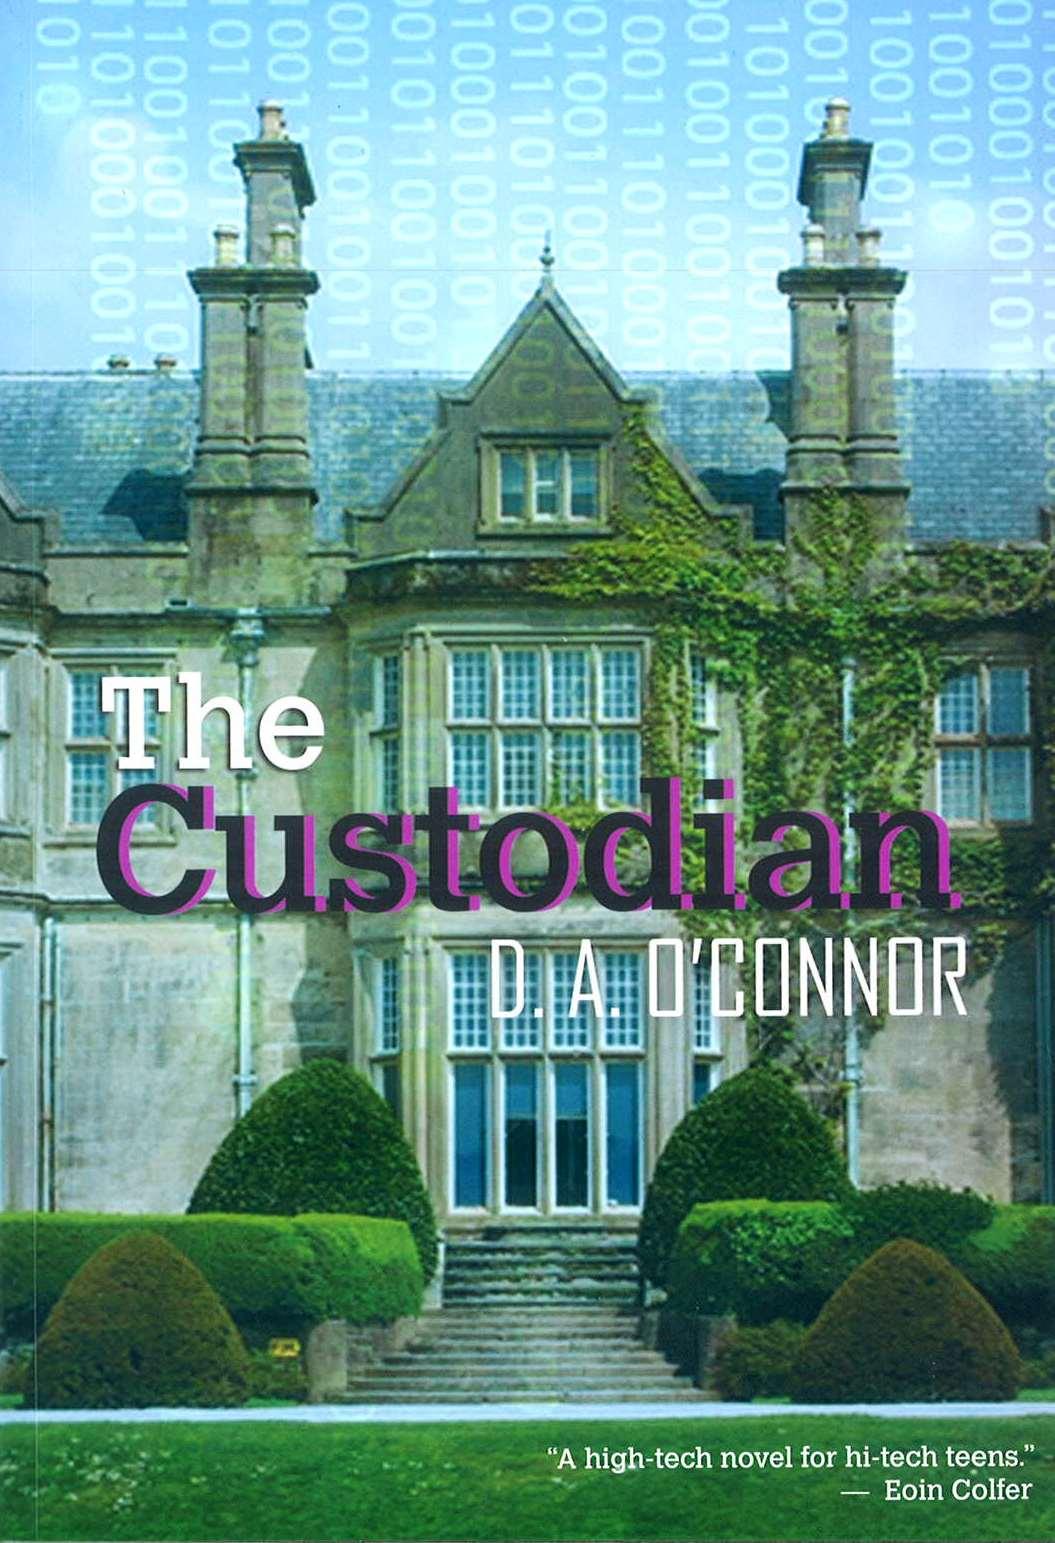 The Custodian - School Novel Pack - Novel & Workbook